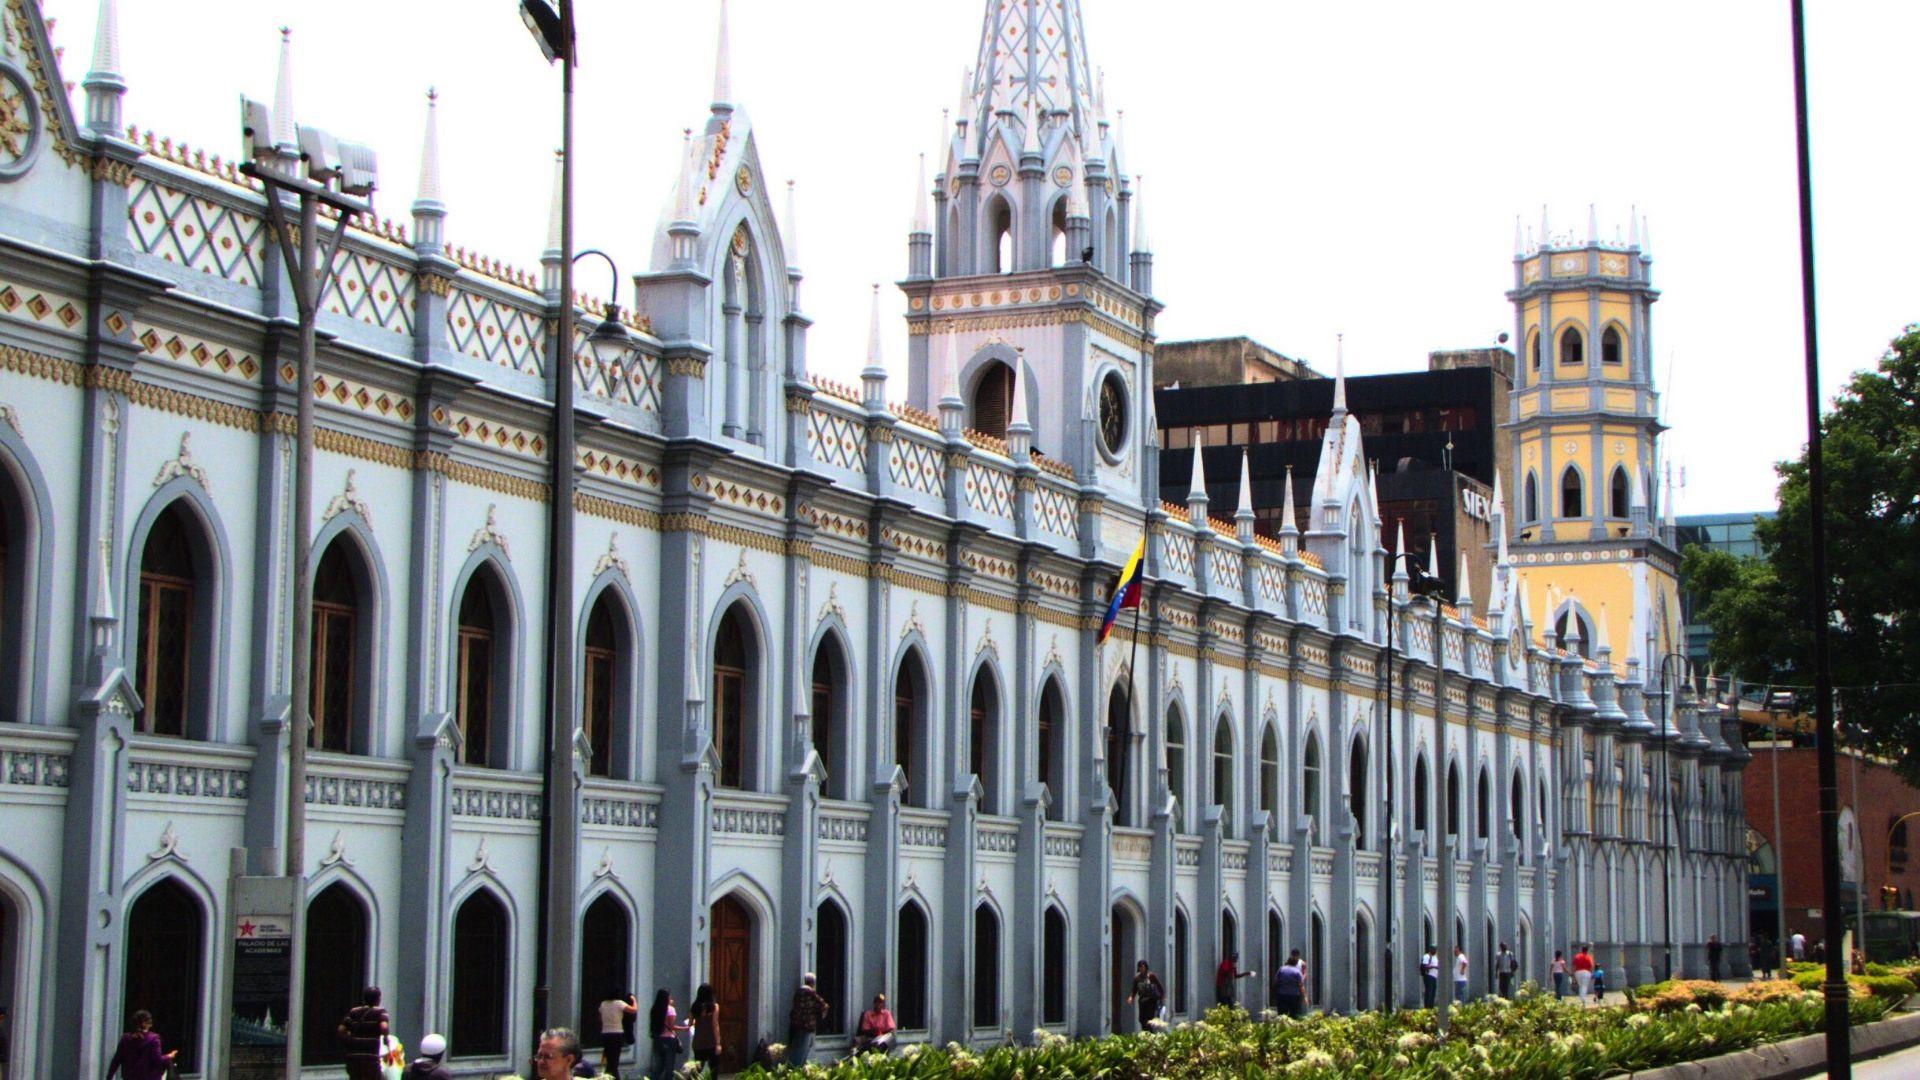 Academia de Ciencias rechaza amenazas de Diosdado Cabello